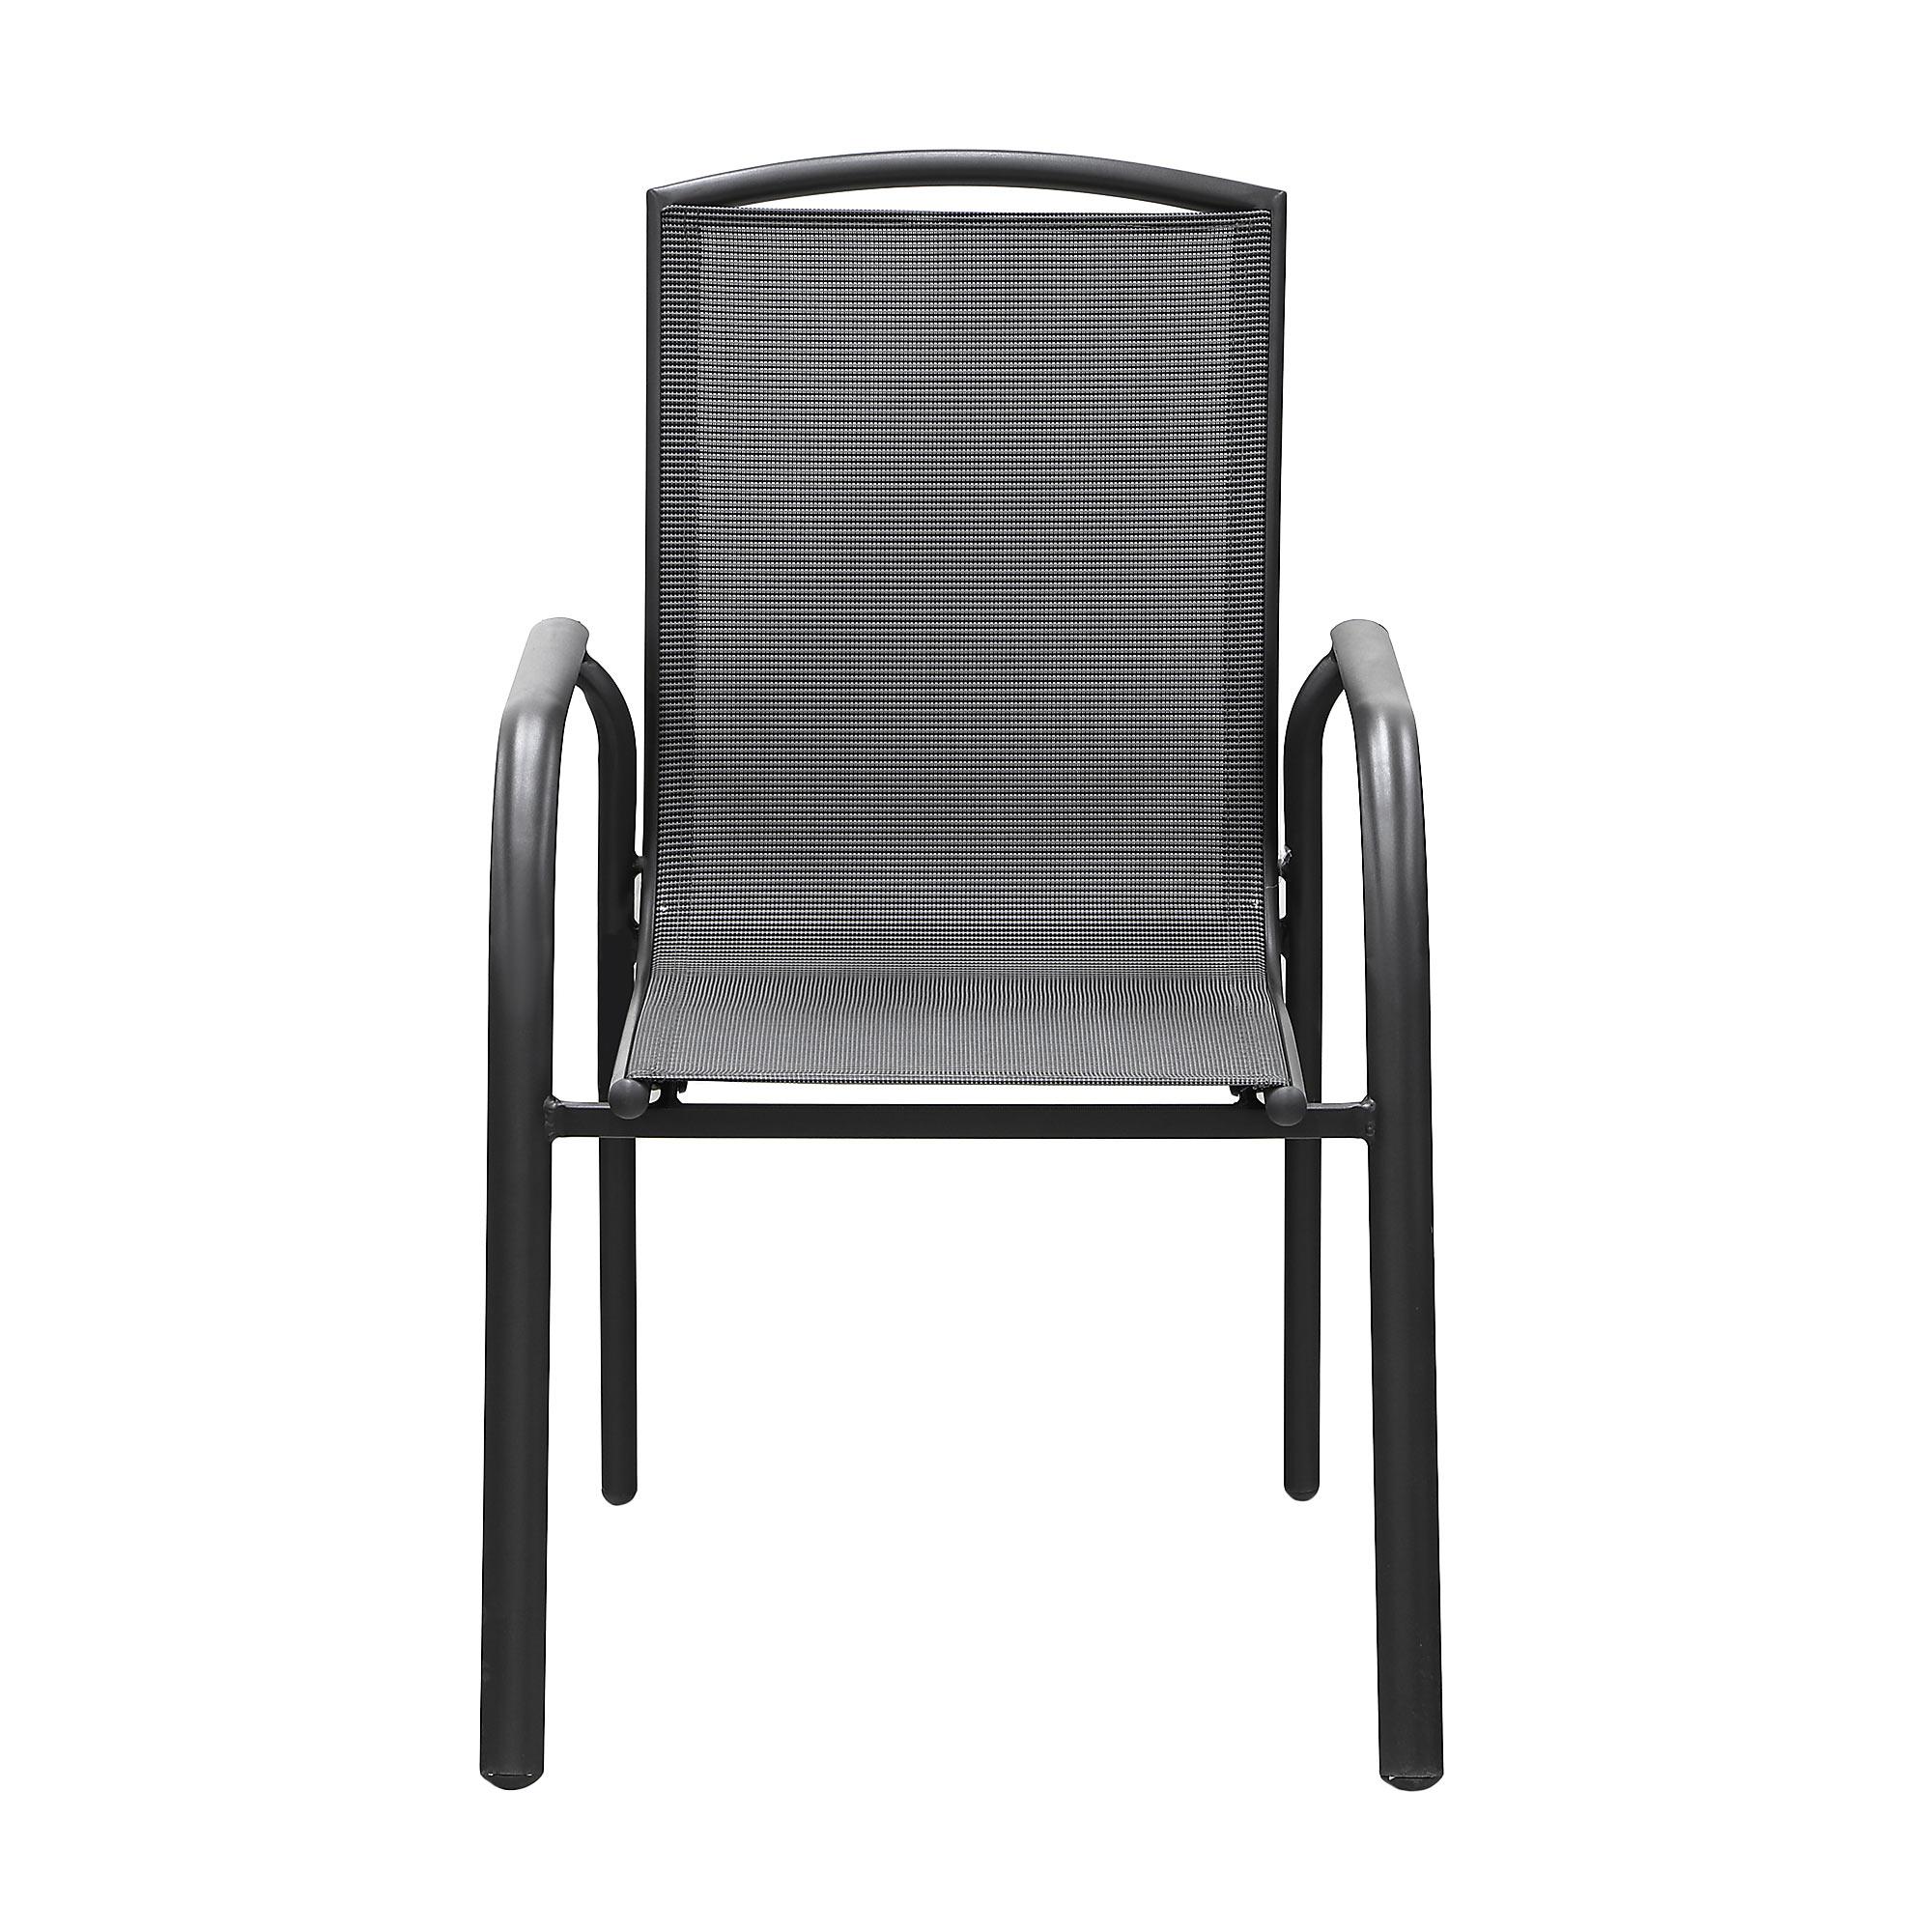 Стул Koopman furniture 58,5x60,2x93 см